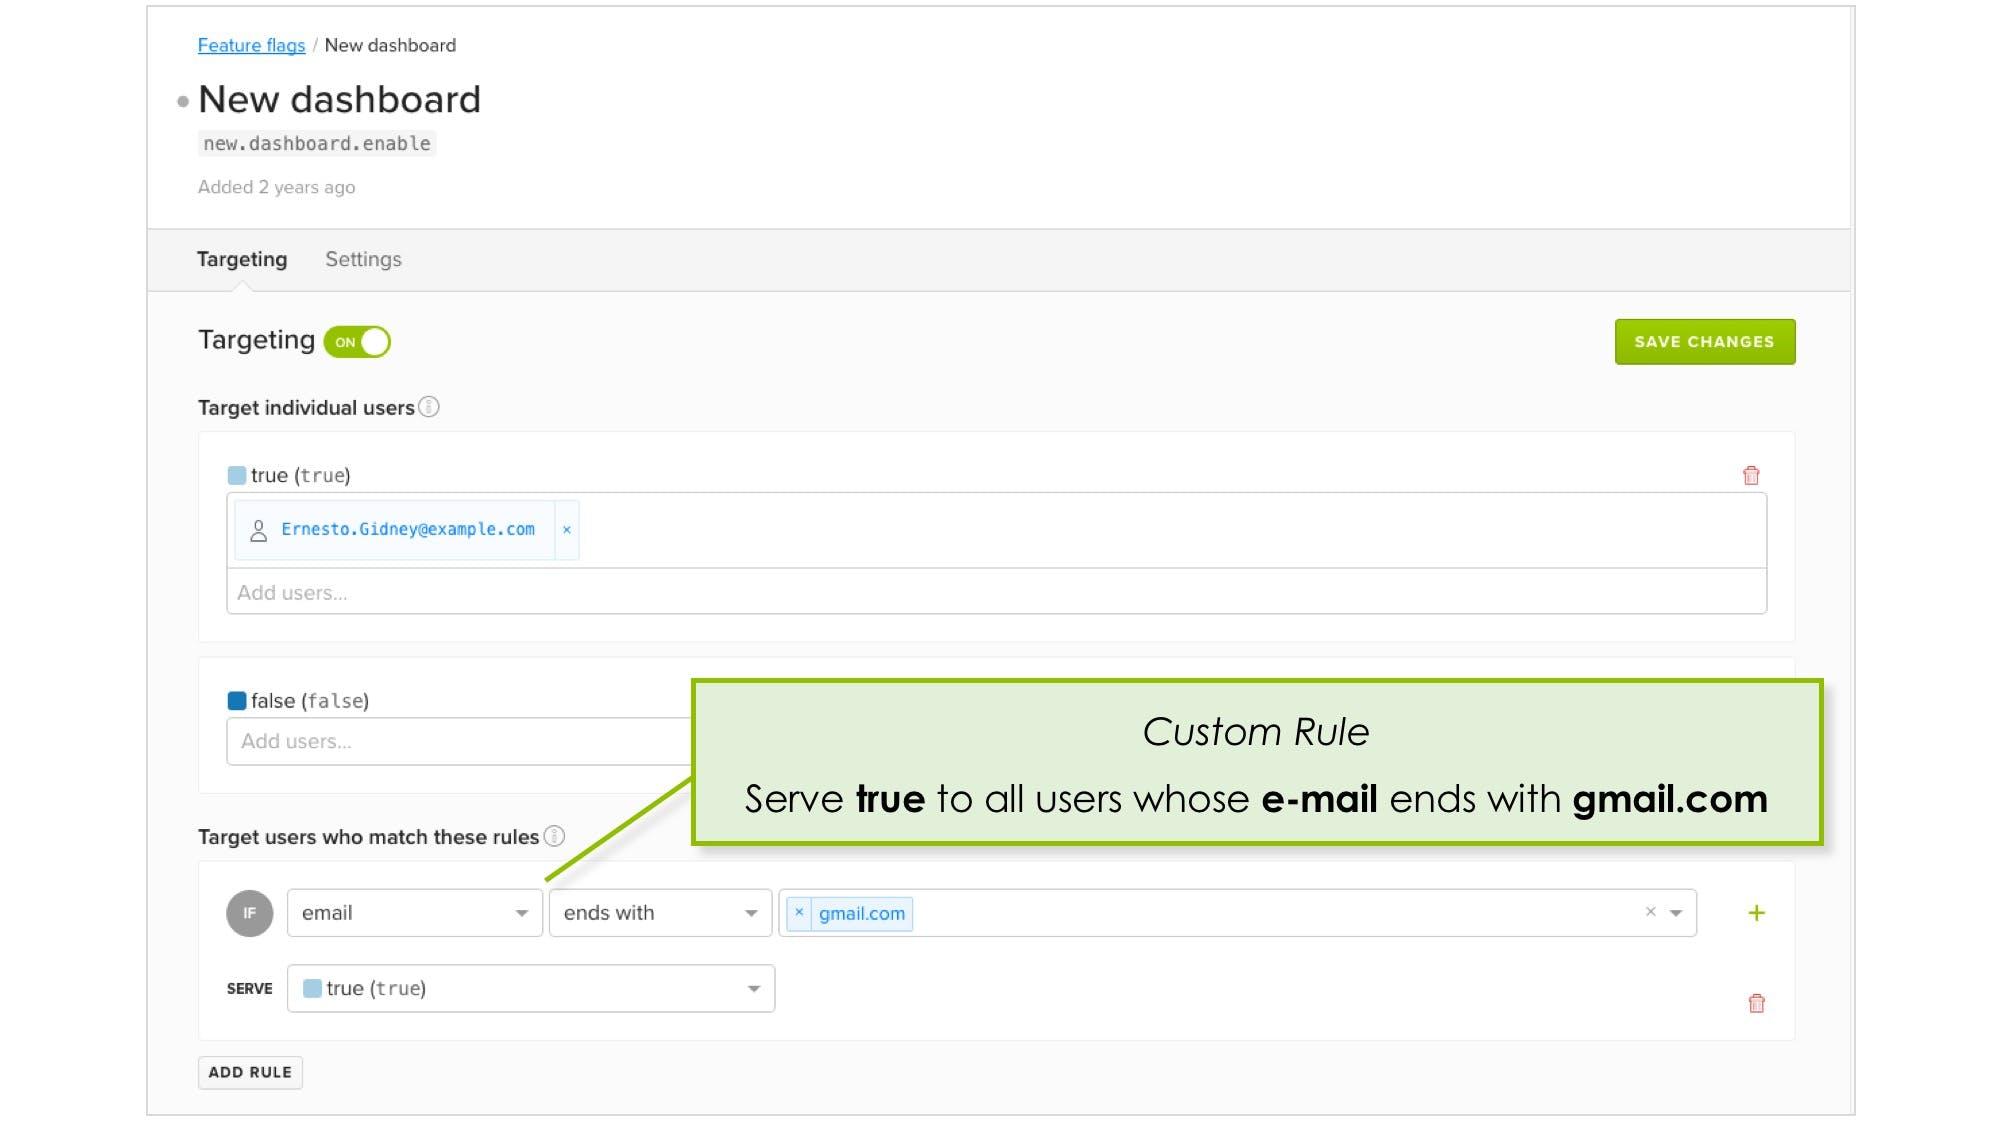 LaunchDarkly Custom Targeting Rule